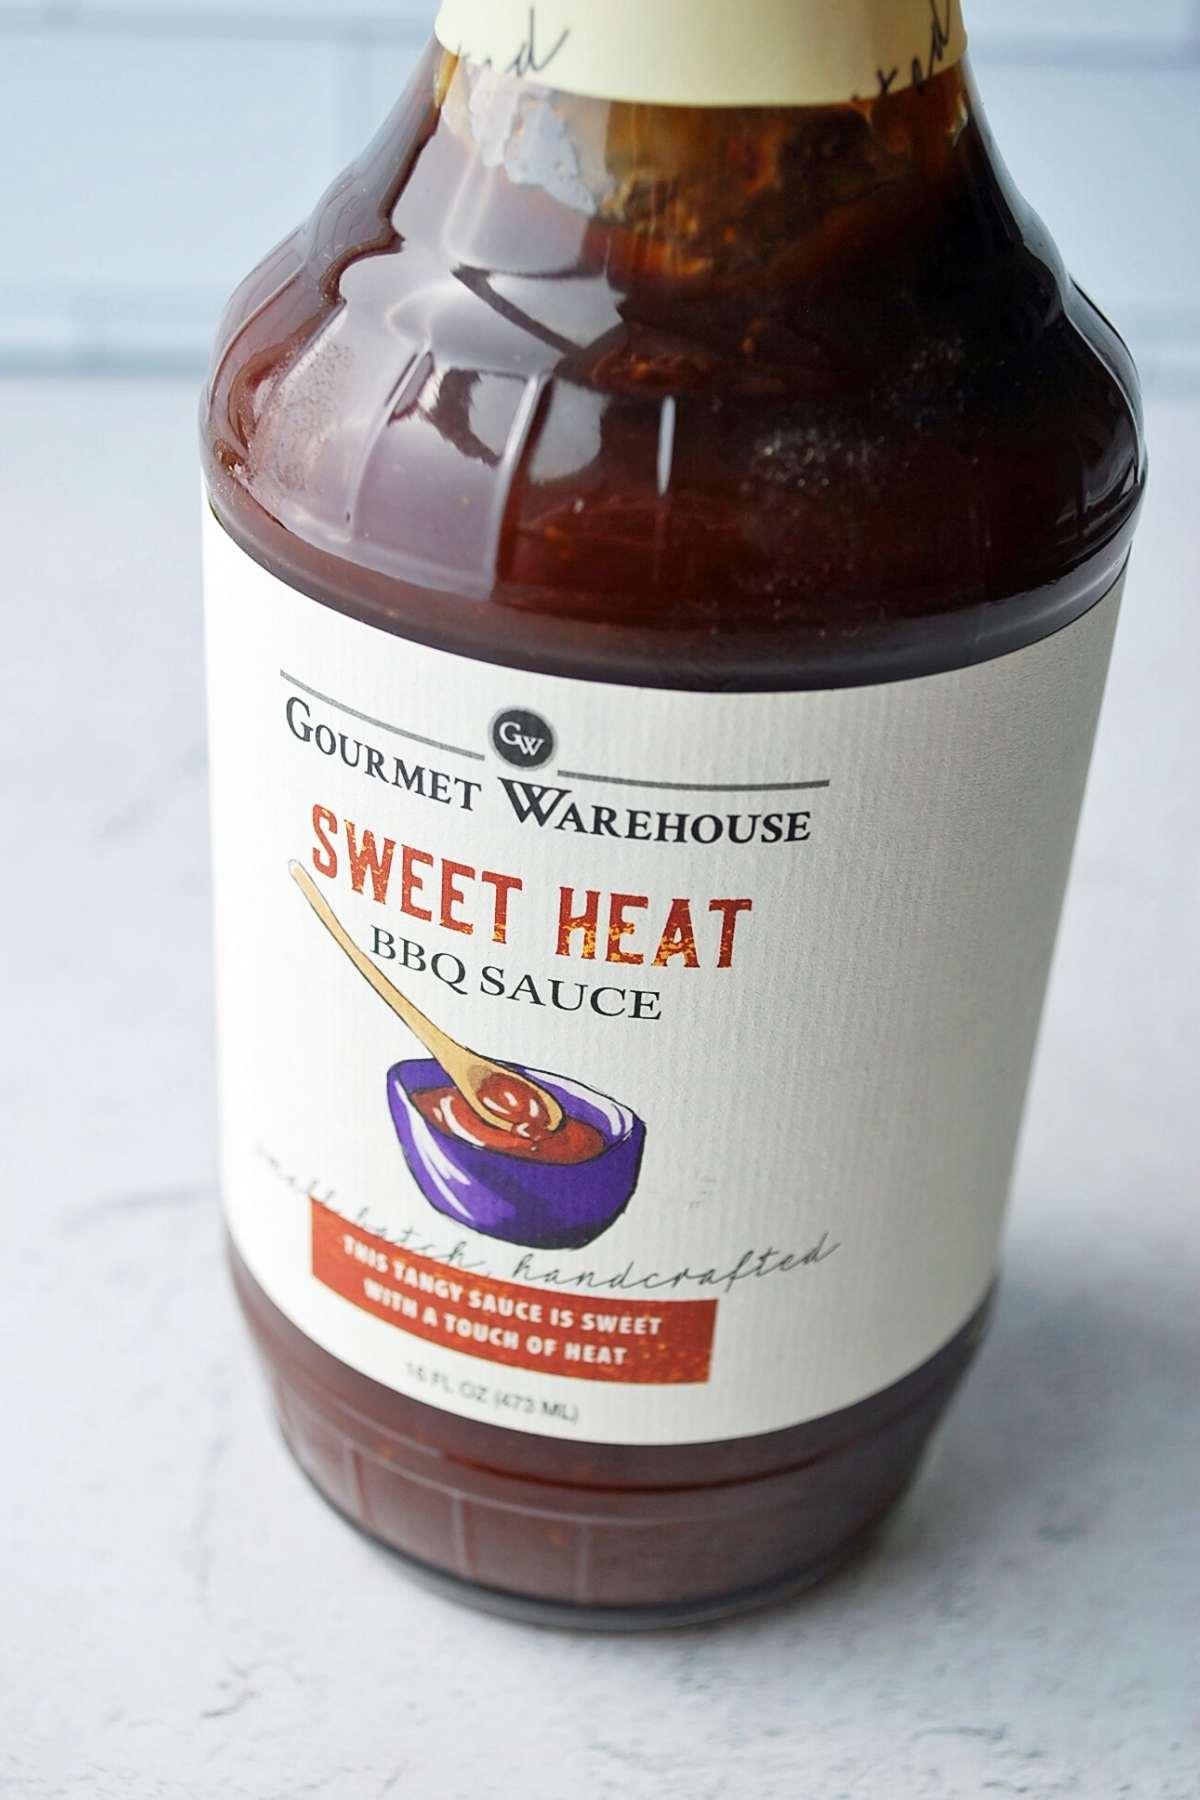 Gourmet warehouse sweet heat barbecue sauce